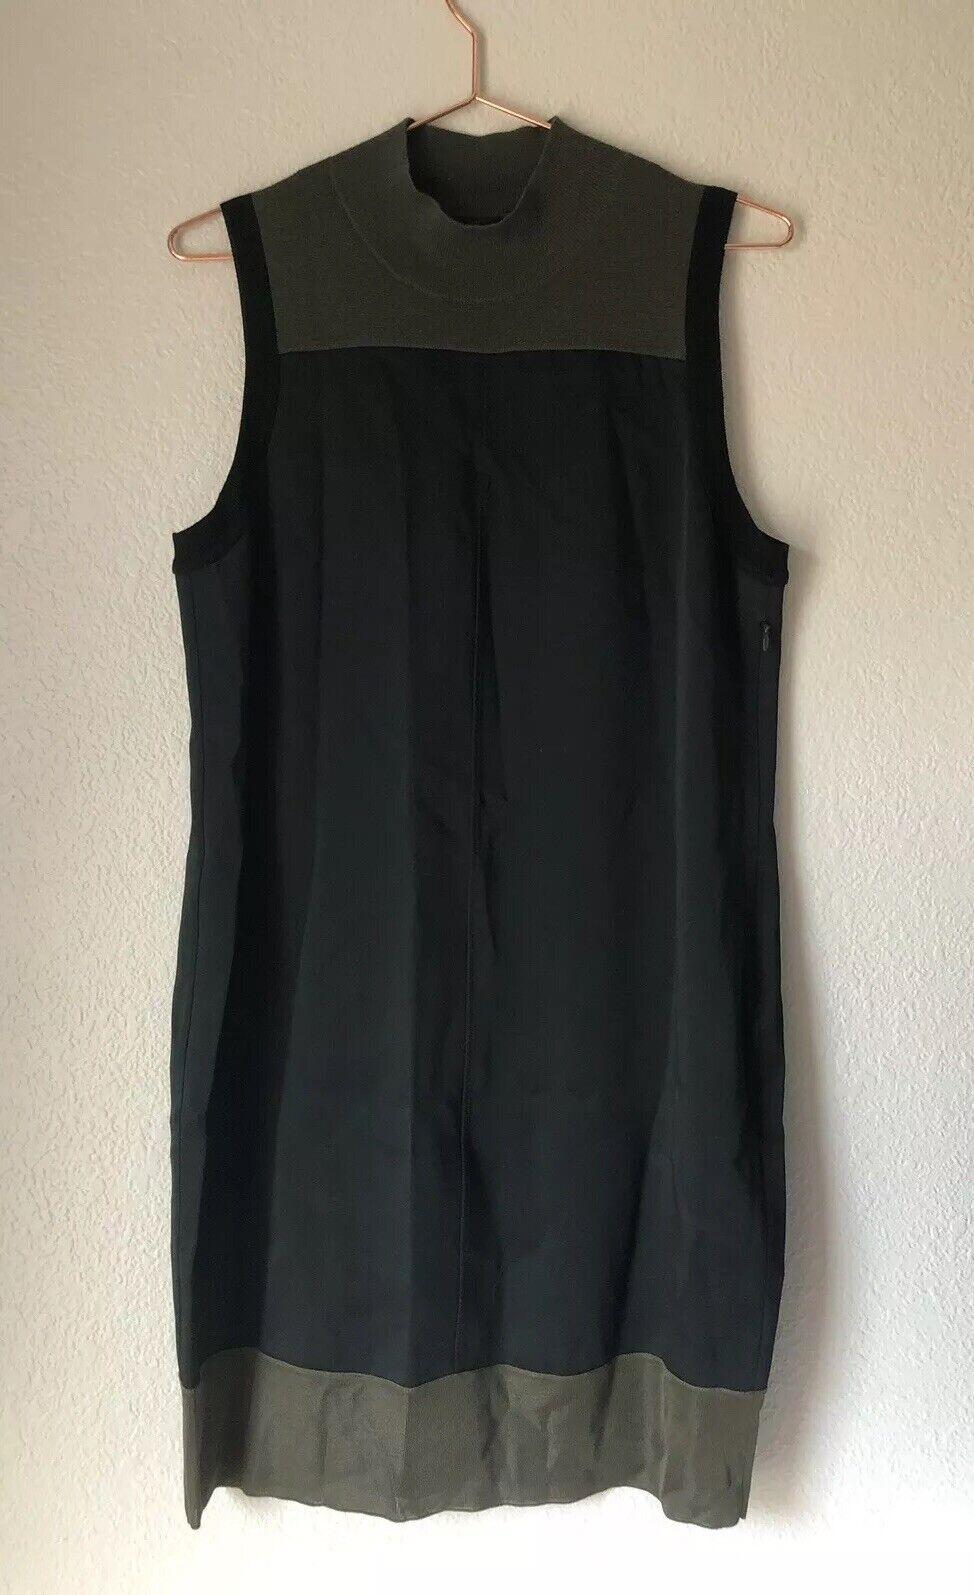 Rag & Bone Woherren Vivienne Farbe Block Shift Dress Sz M schwarz Olive Sleeveless